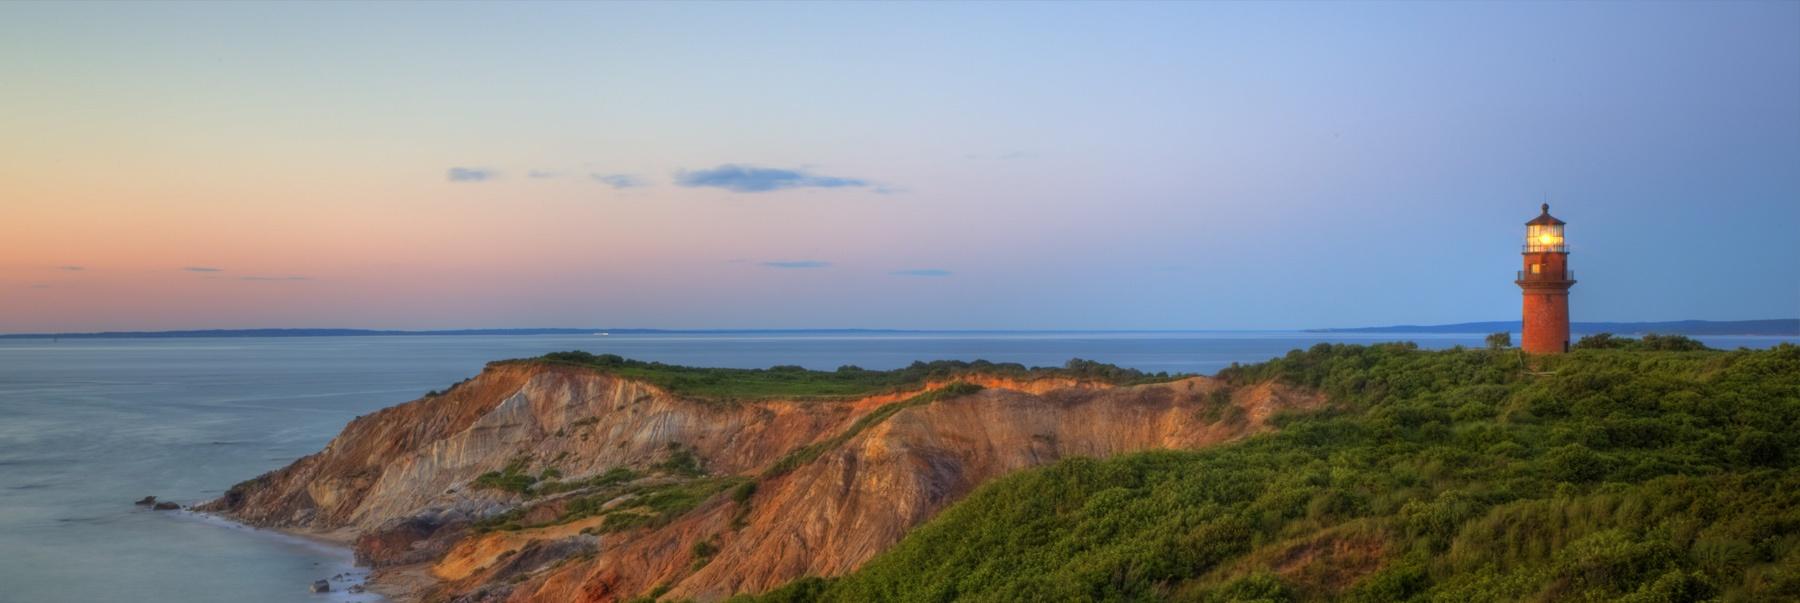 lighthouse-on-cliff.jpg